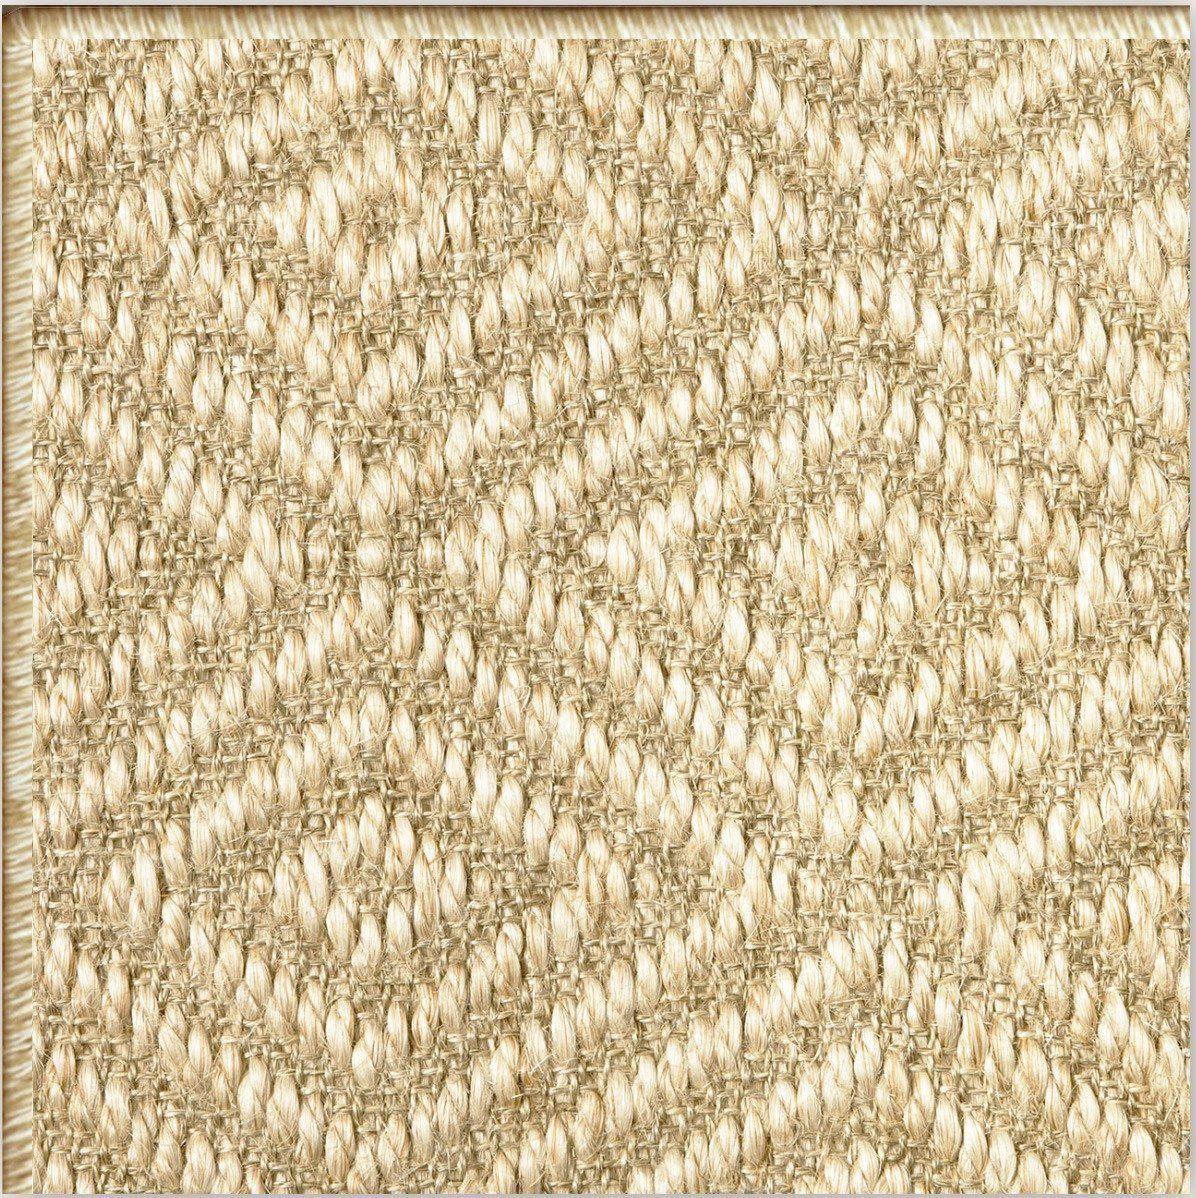 Diamond Sisal Ii W Serging Compare To Stark Pueblo Sisal Rug Hemphill S Rugs Carpets Inc Sisalrugs Diamond Sisal Sisal Rug Rugs On Carpet